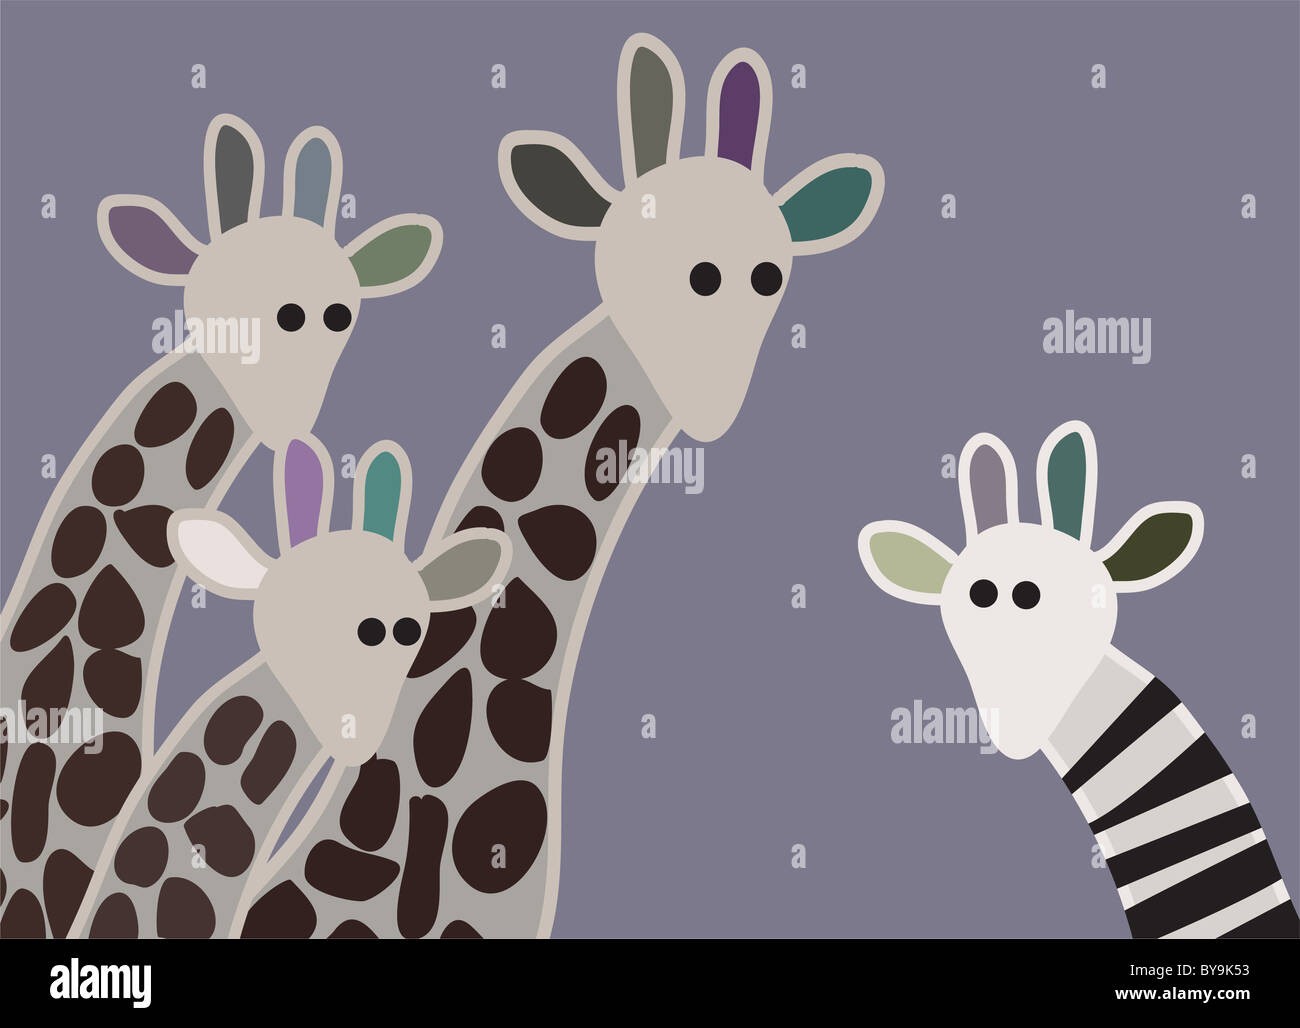 Famille girafe à la surprise, avec marquage différents girafe Photo Stock